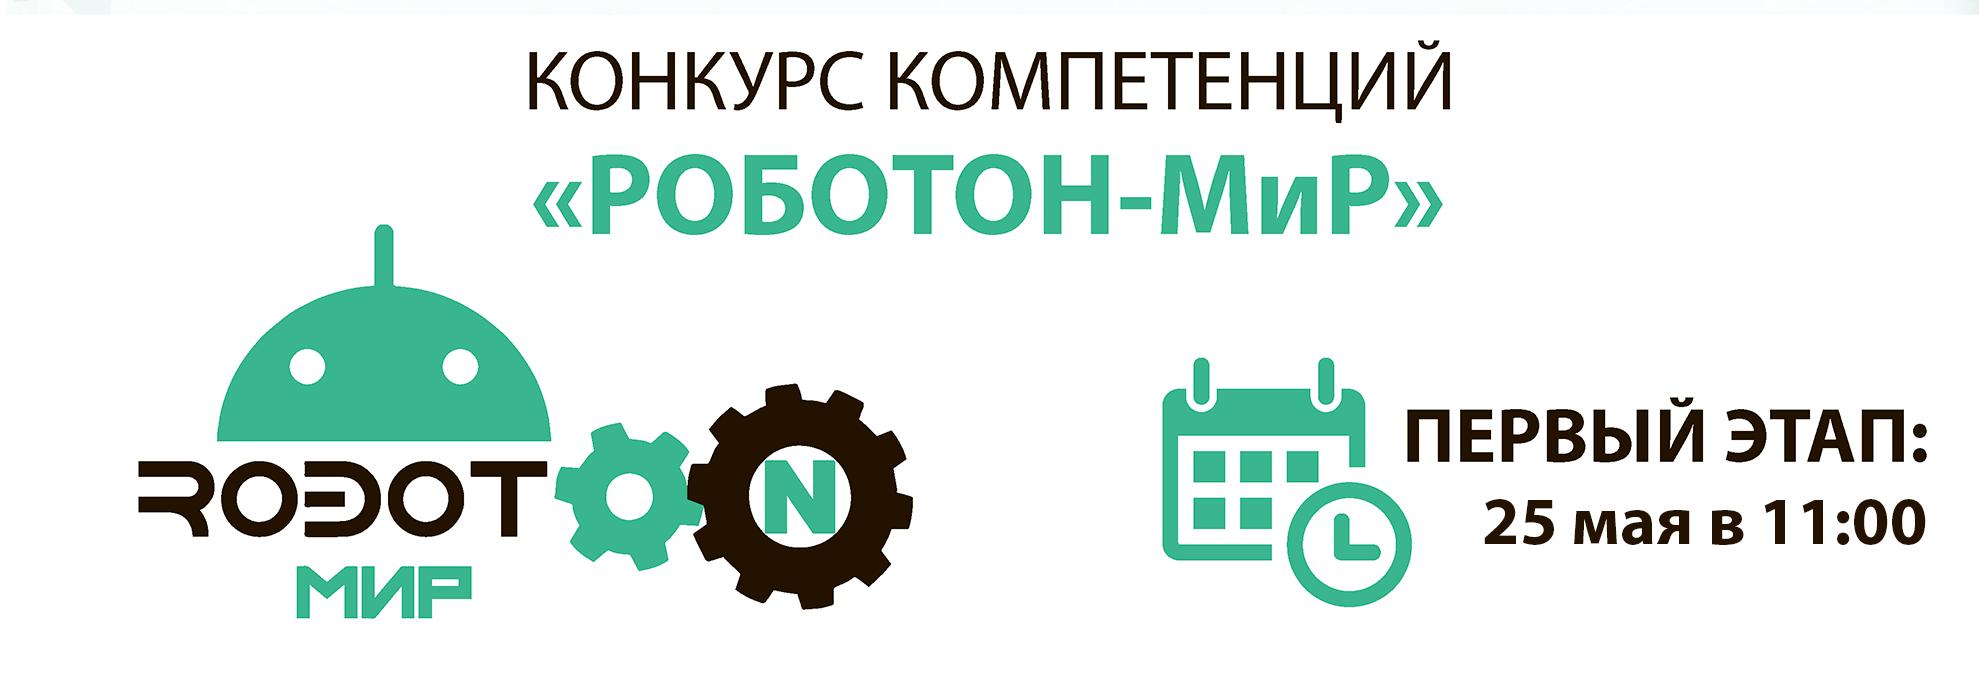 РОБОТОН-МиР 2019